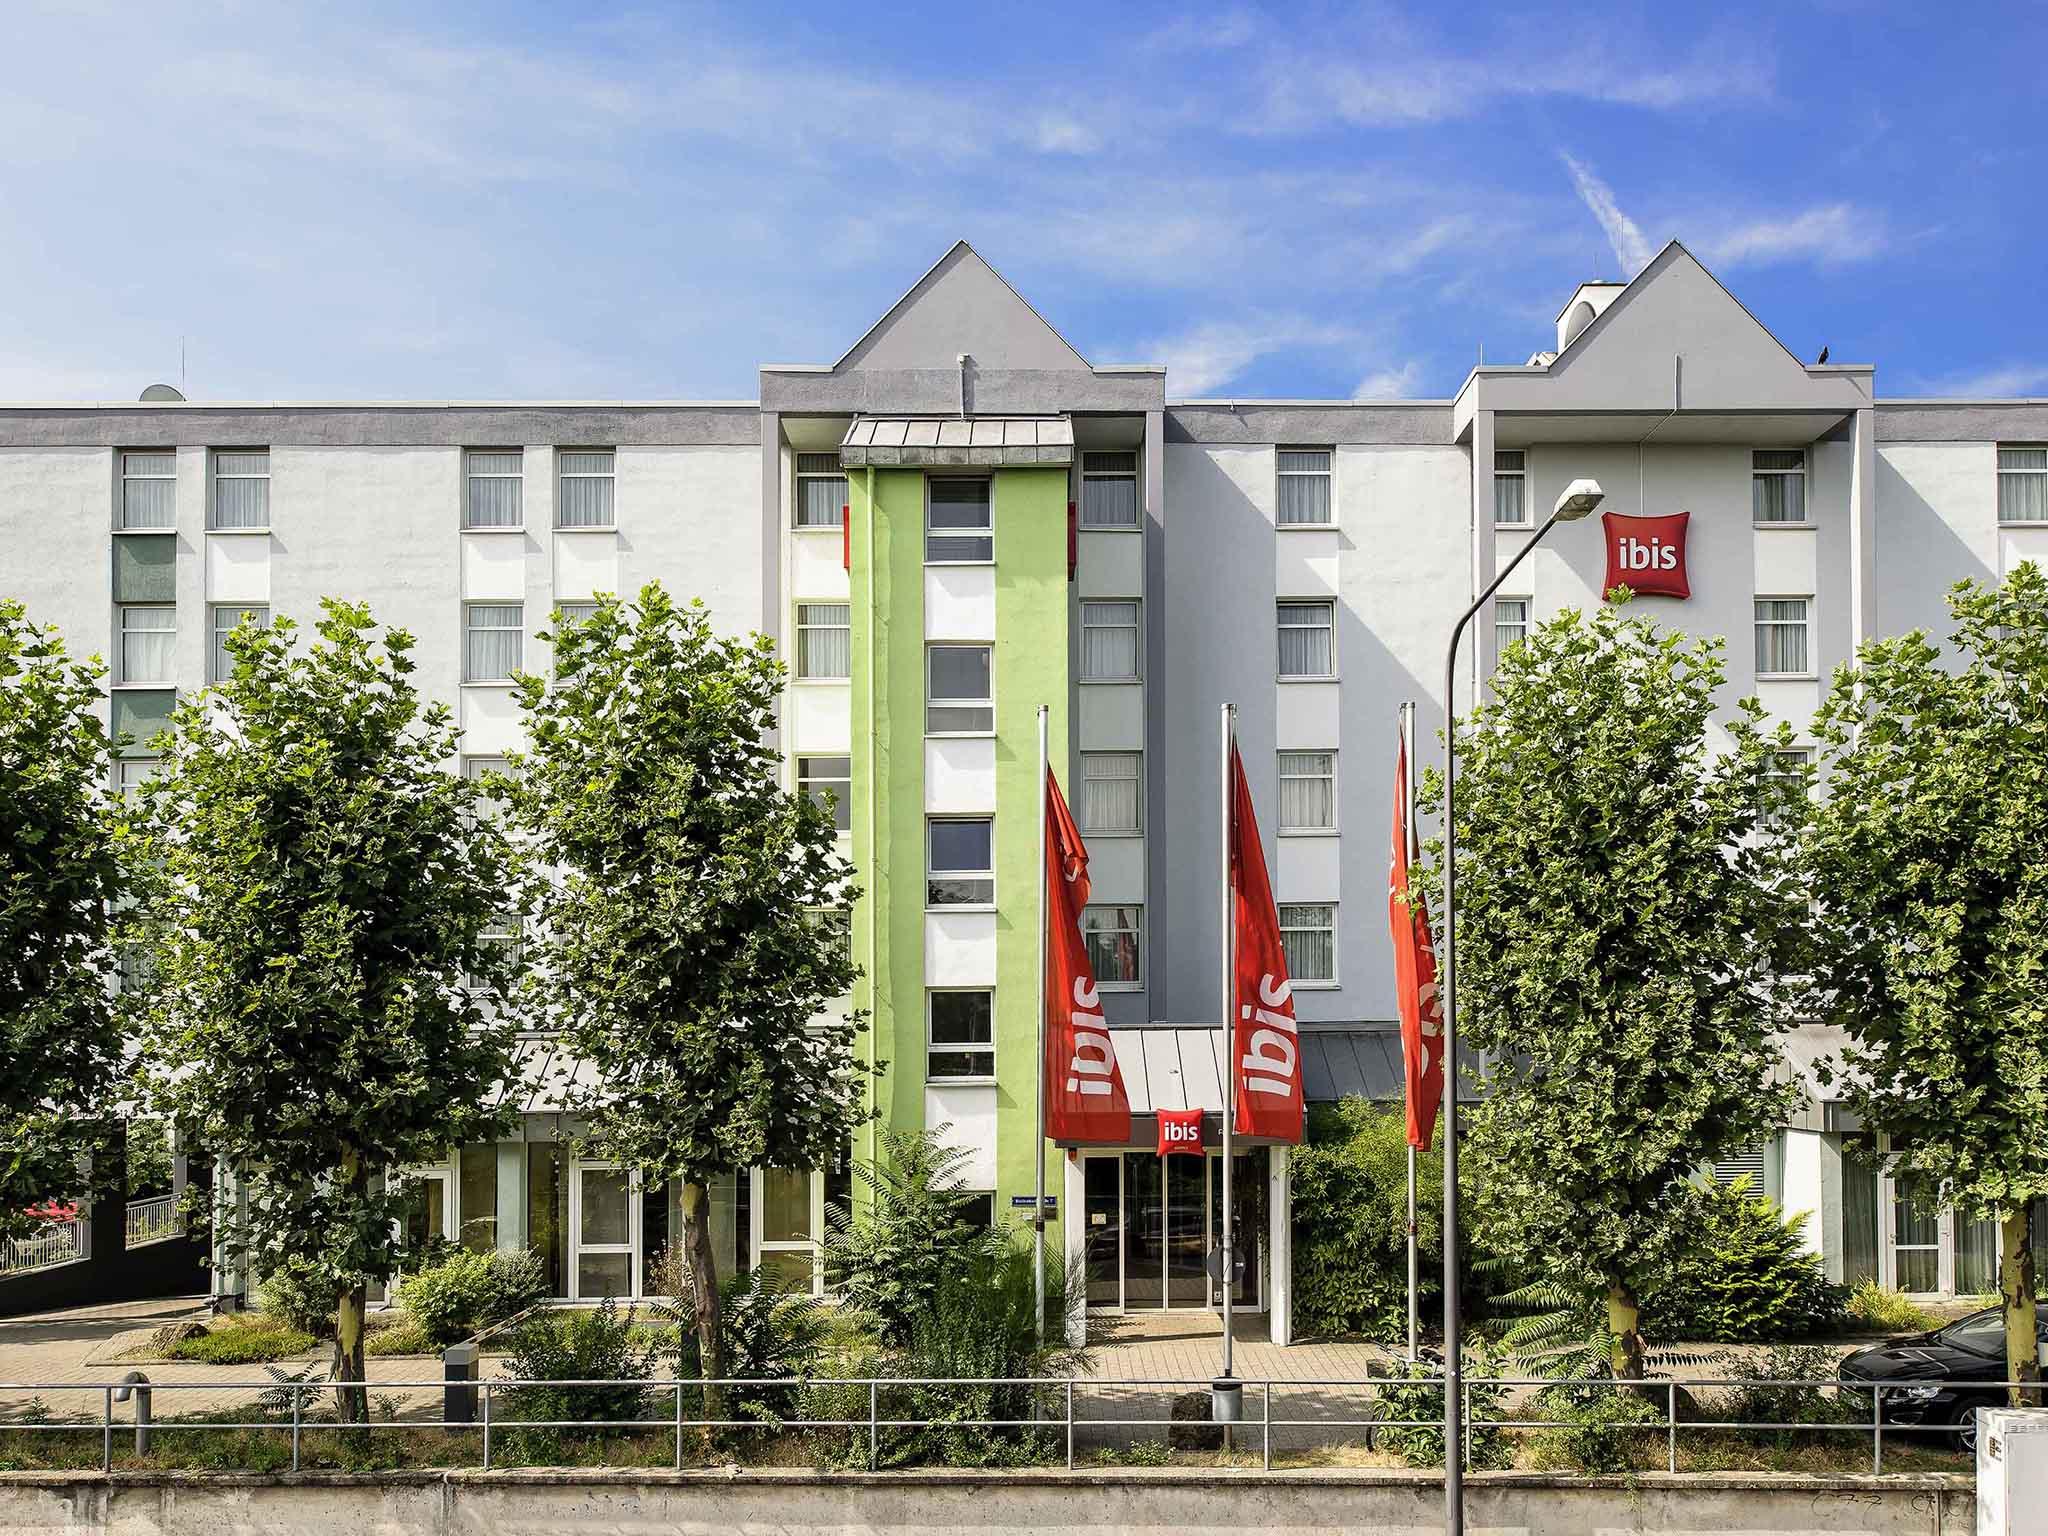 فندق - إيبيس ibis فرانكفورت ميسي ويست